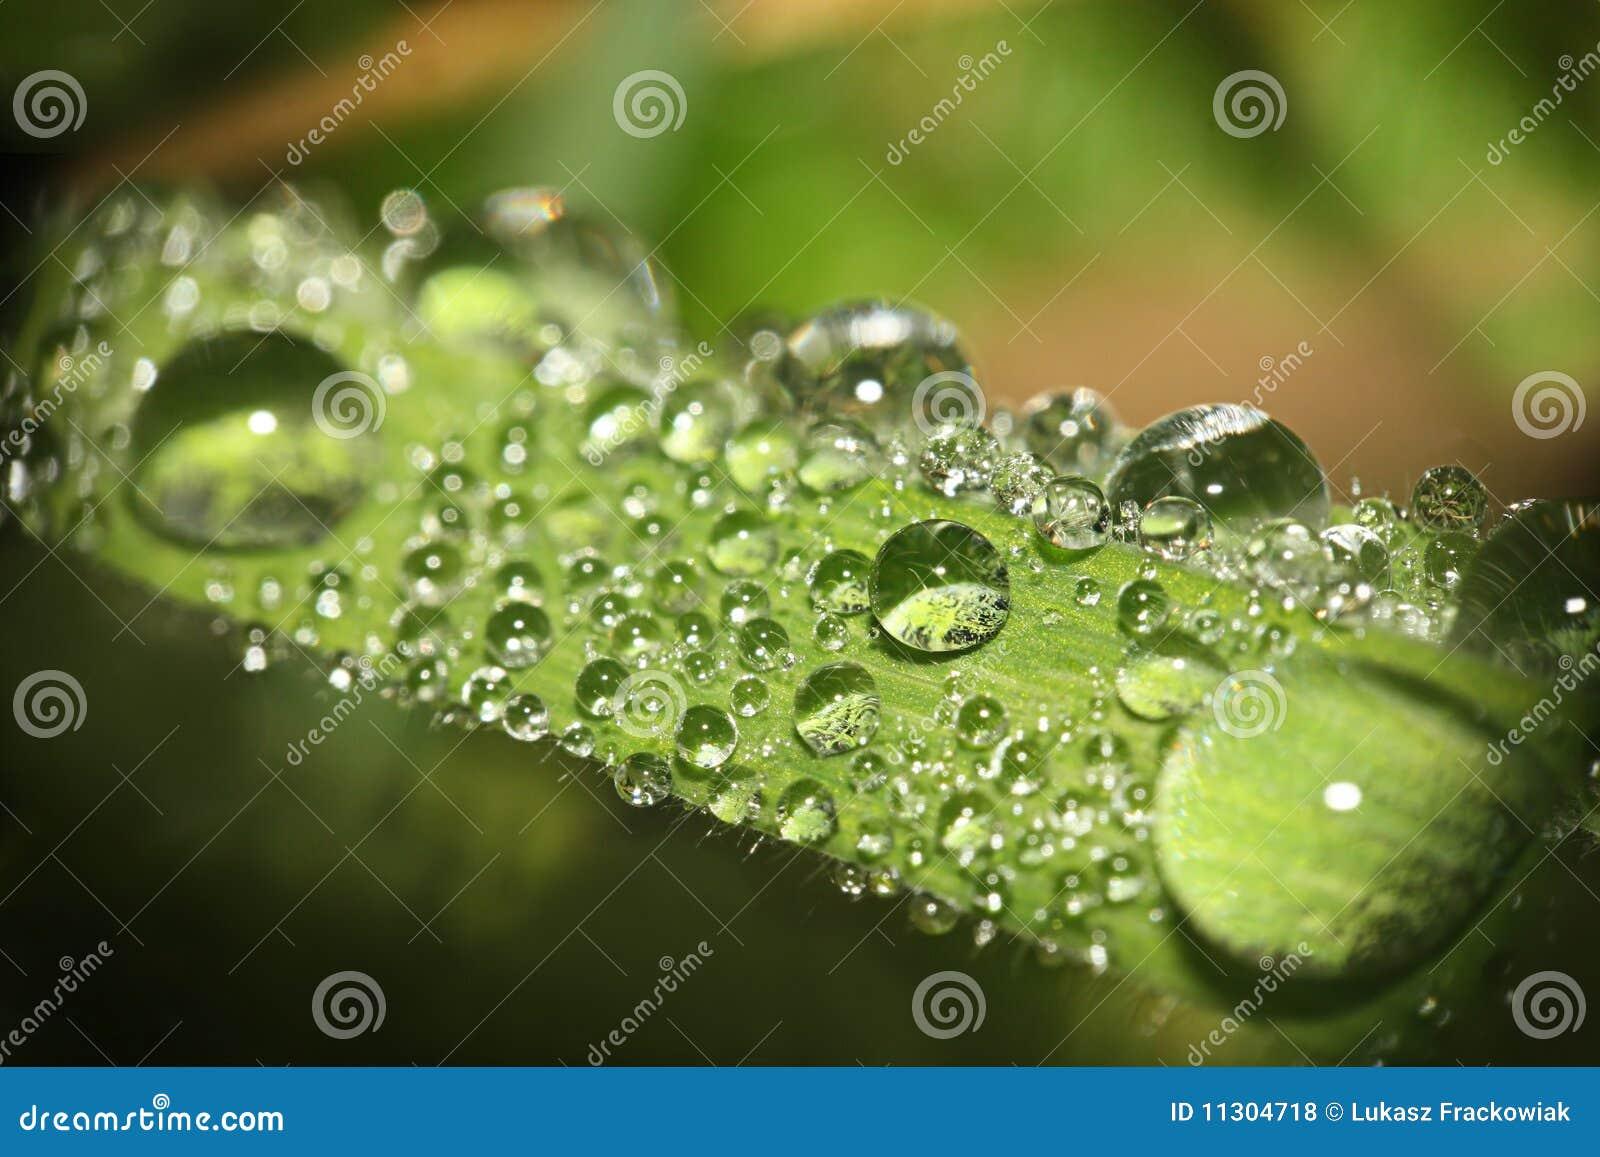 Shinewassertropfen